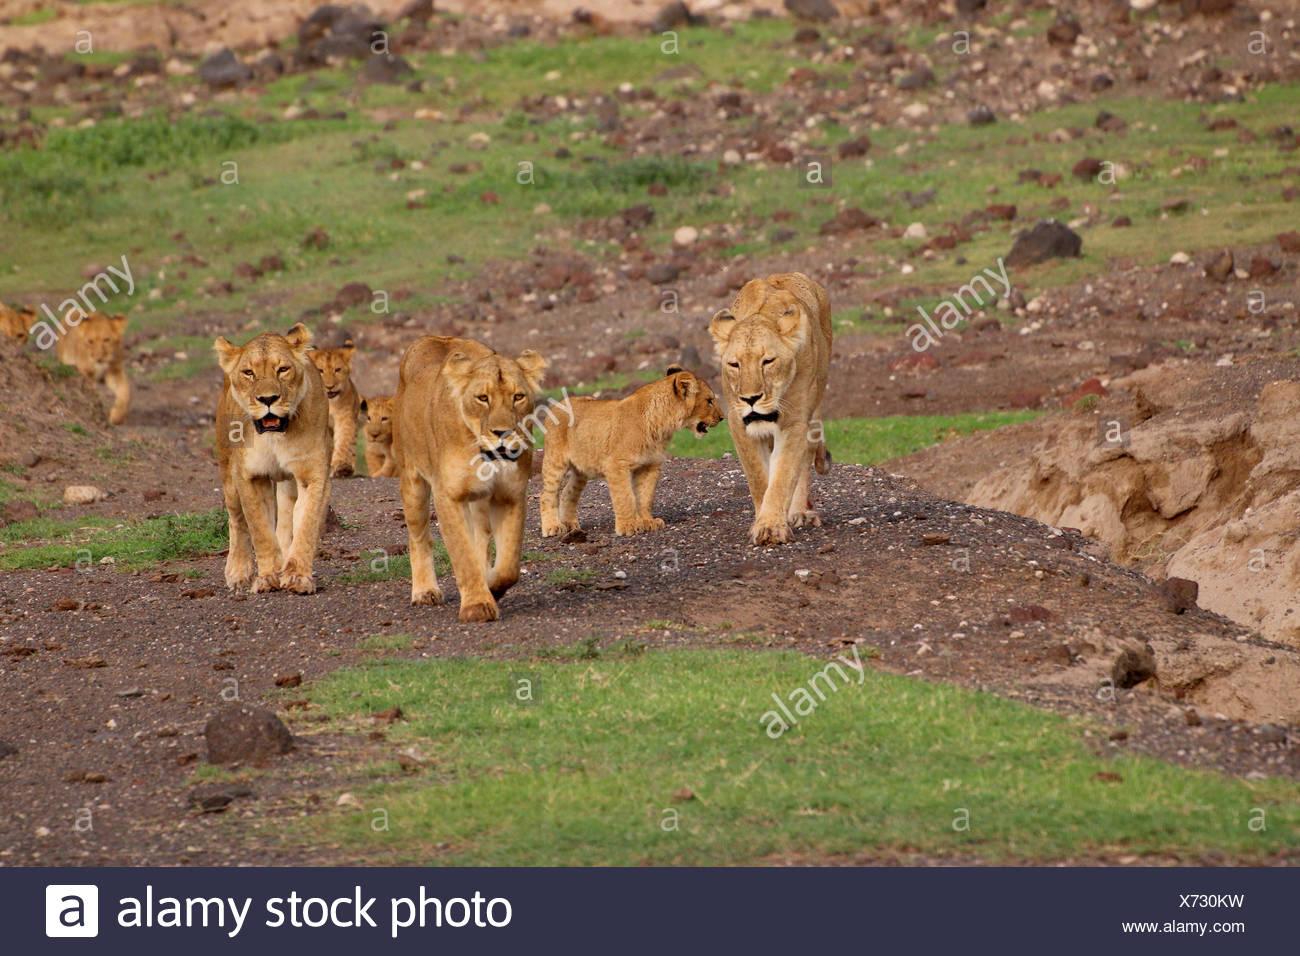 lion (Panthera leo), lion family in Ngorongoro Crater, Tanzania - Stock Image